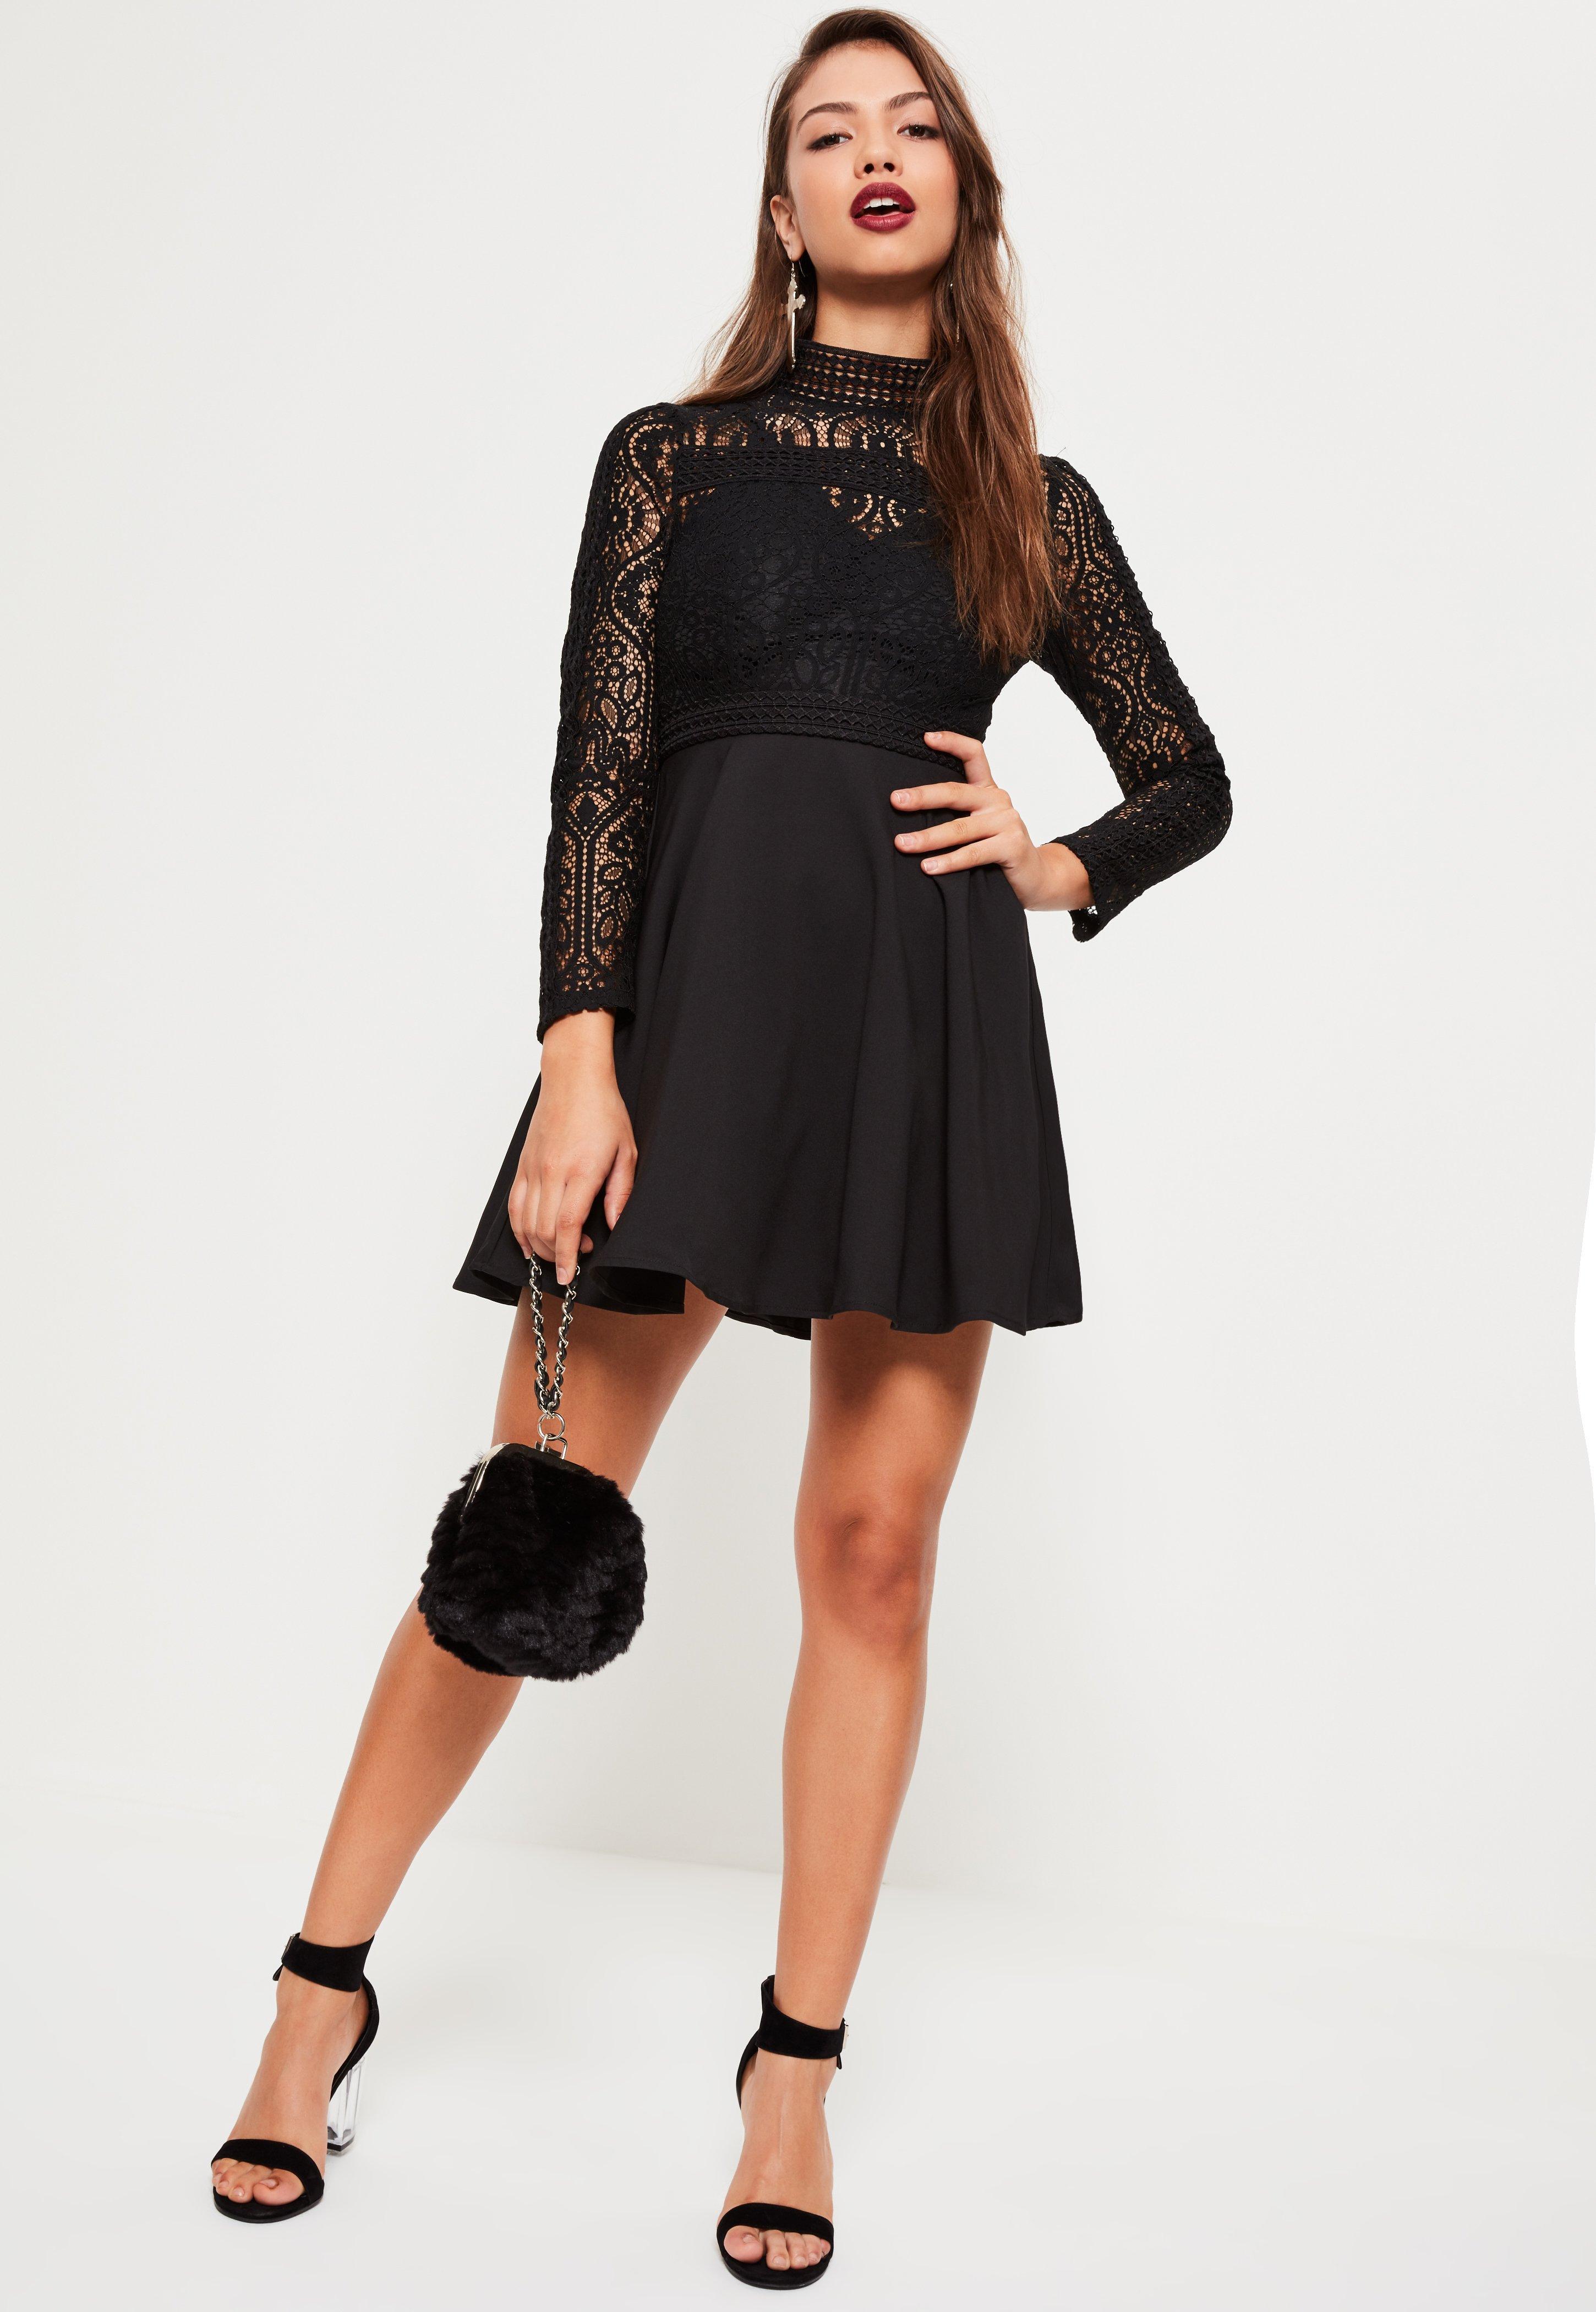 Black Lace High Neck Skater Dress